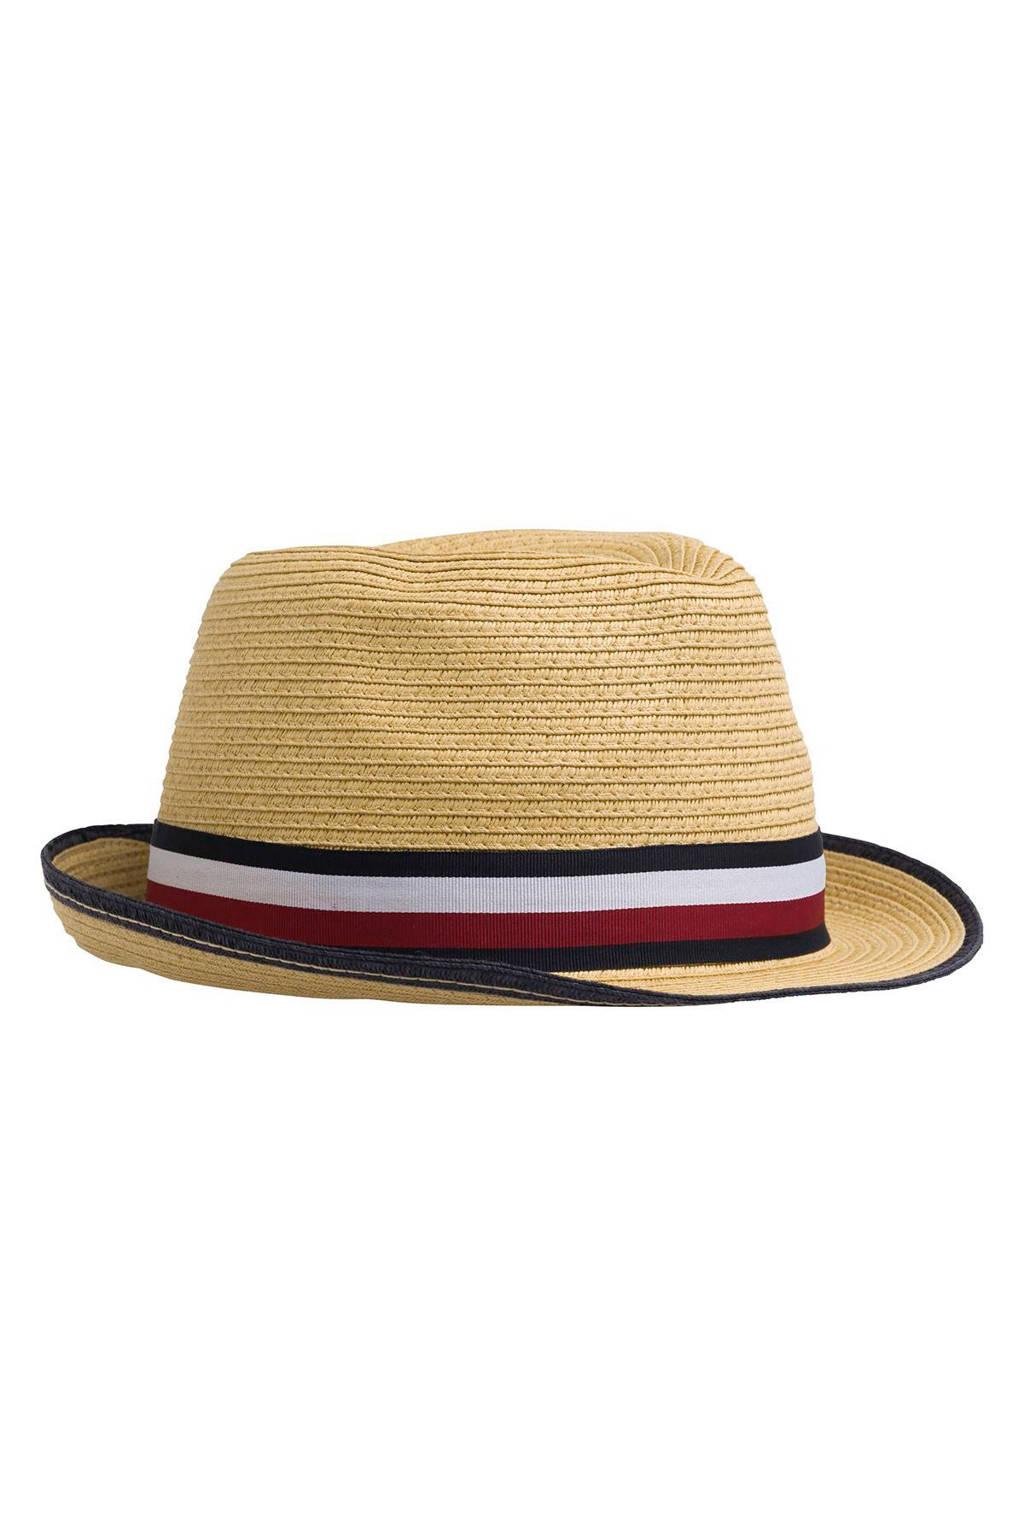 Tommy Hilfiger hoed beige, Beige